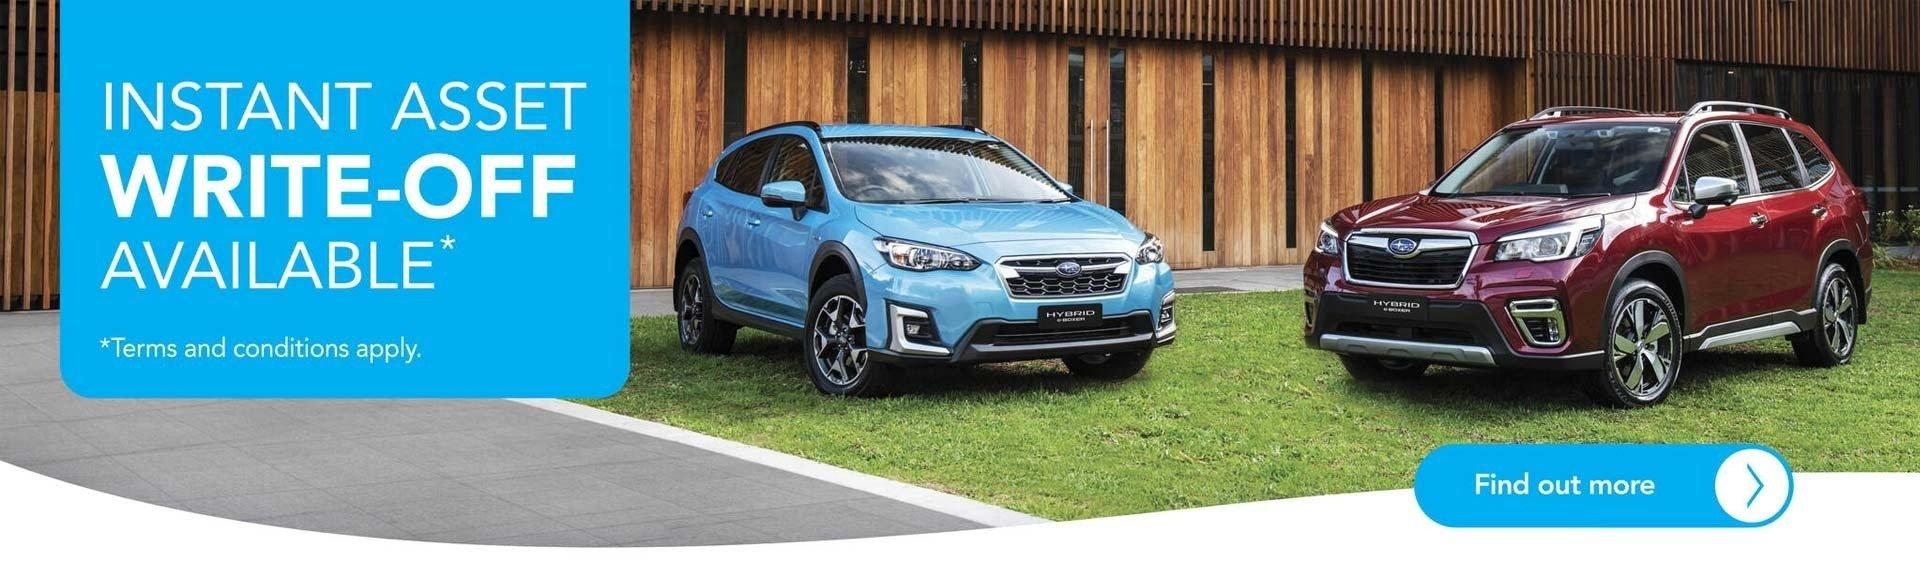 Subaru Instant Asset Write-Off